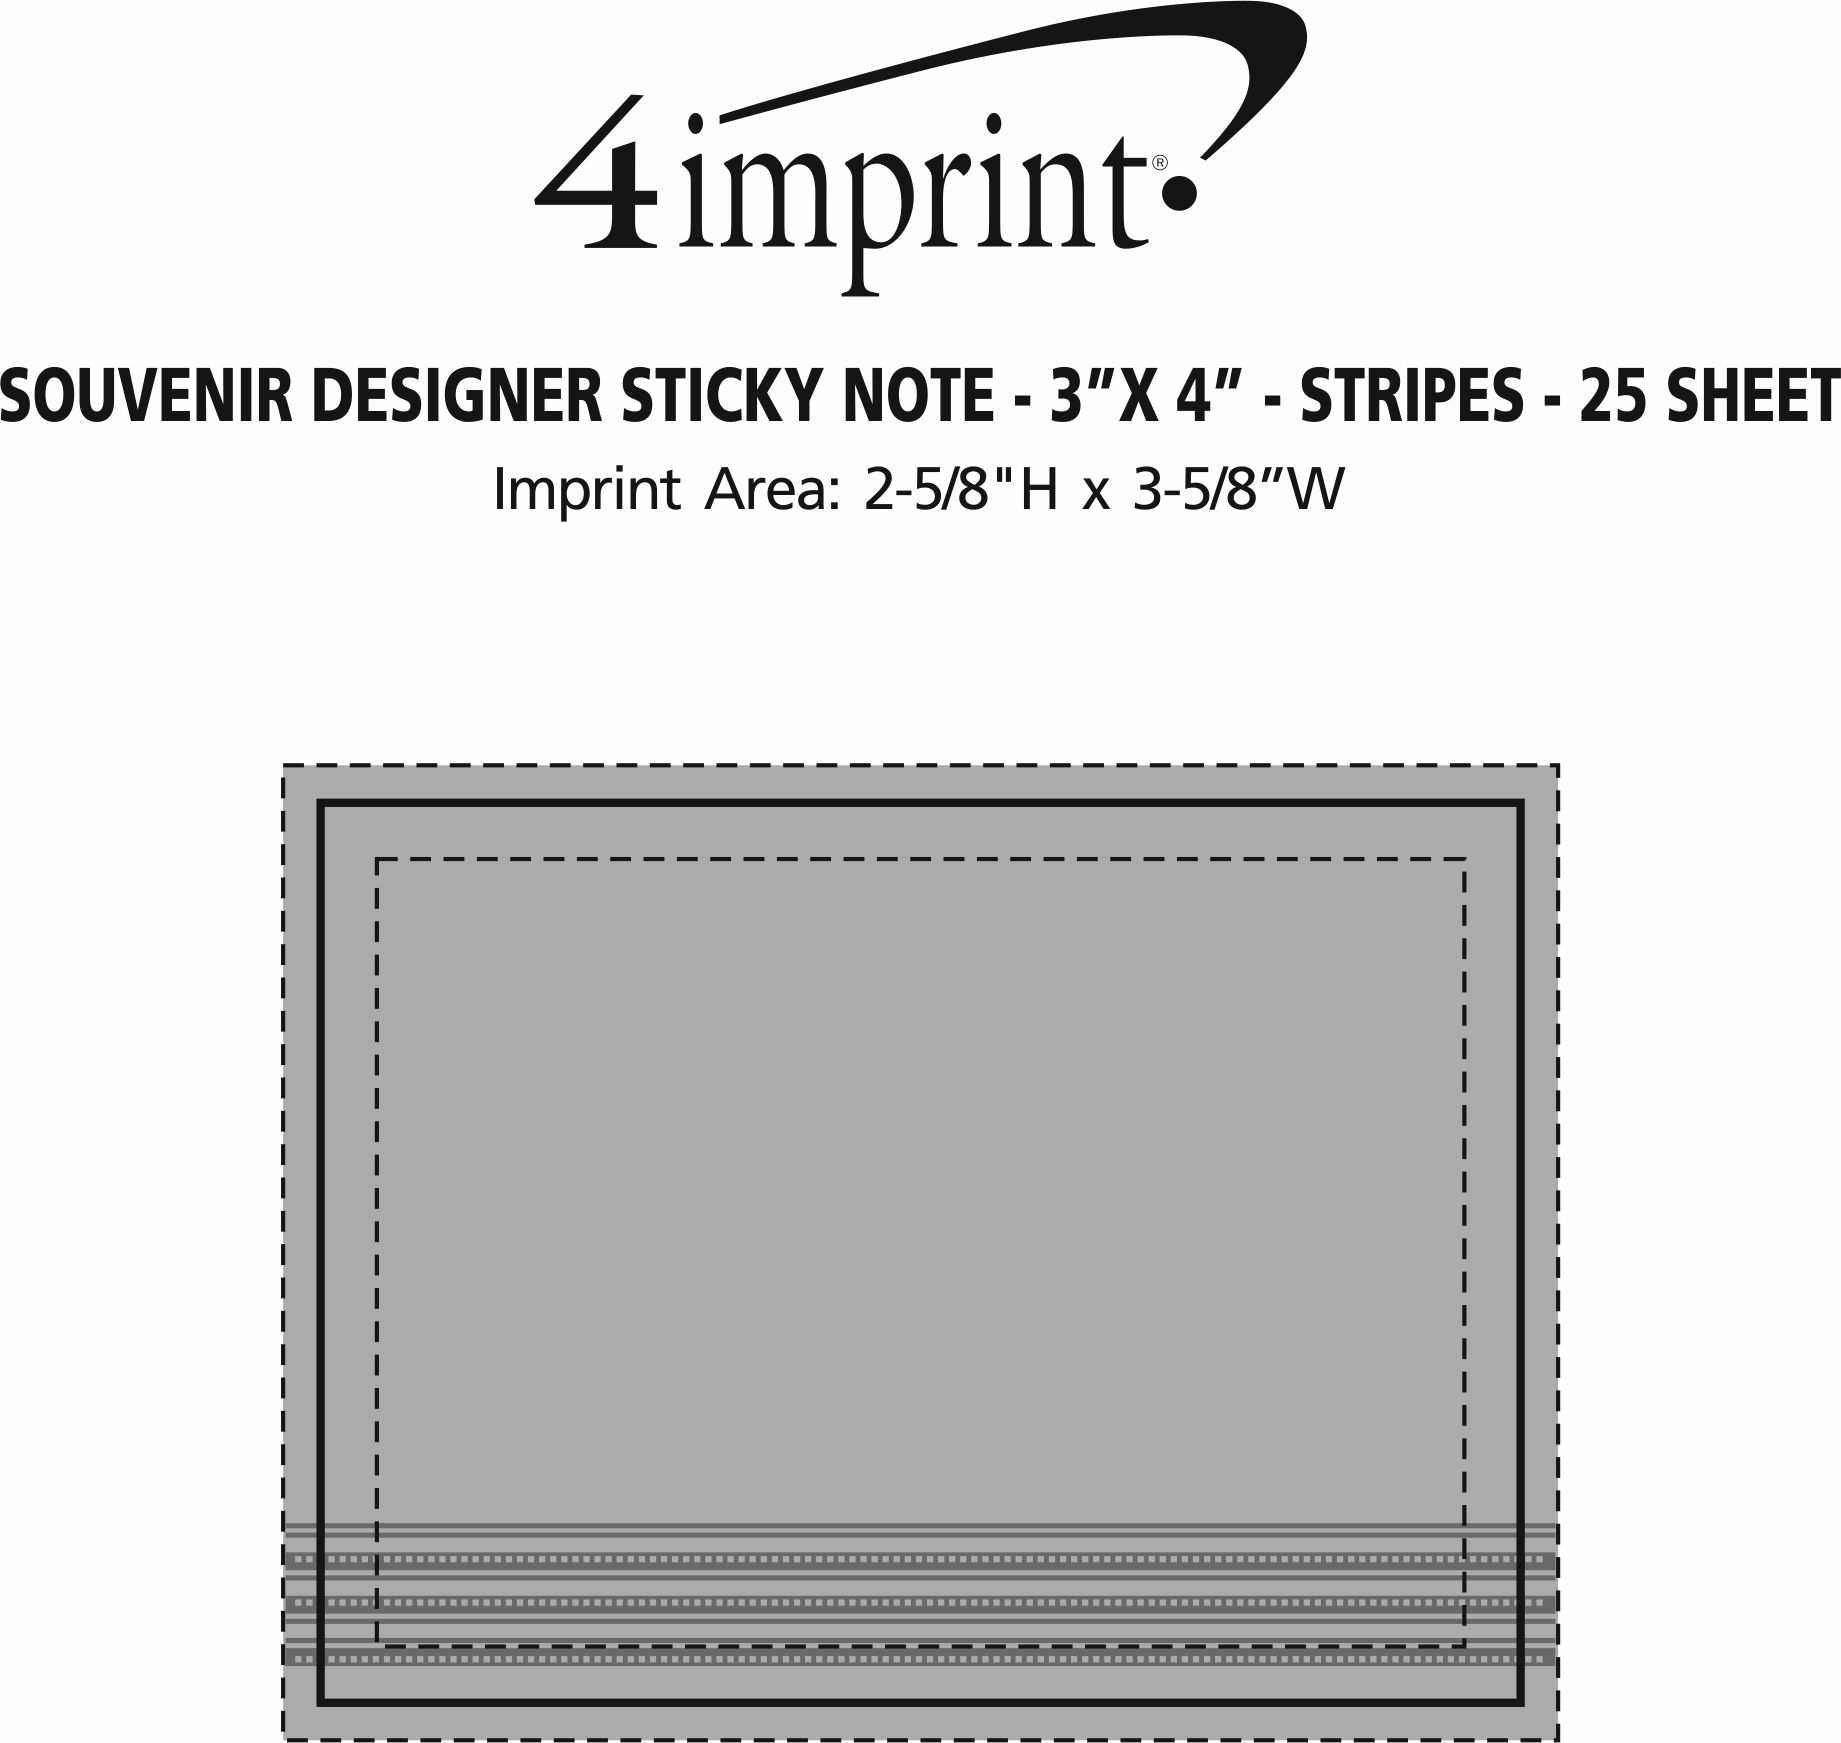 "Imprint Area of Bic Sticky Note - Designer - 3"" x 4"" - Stripes - 25 Sheet"